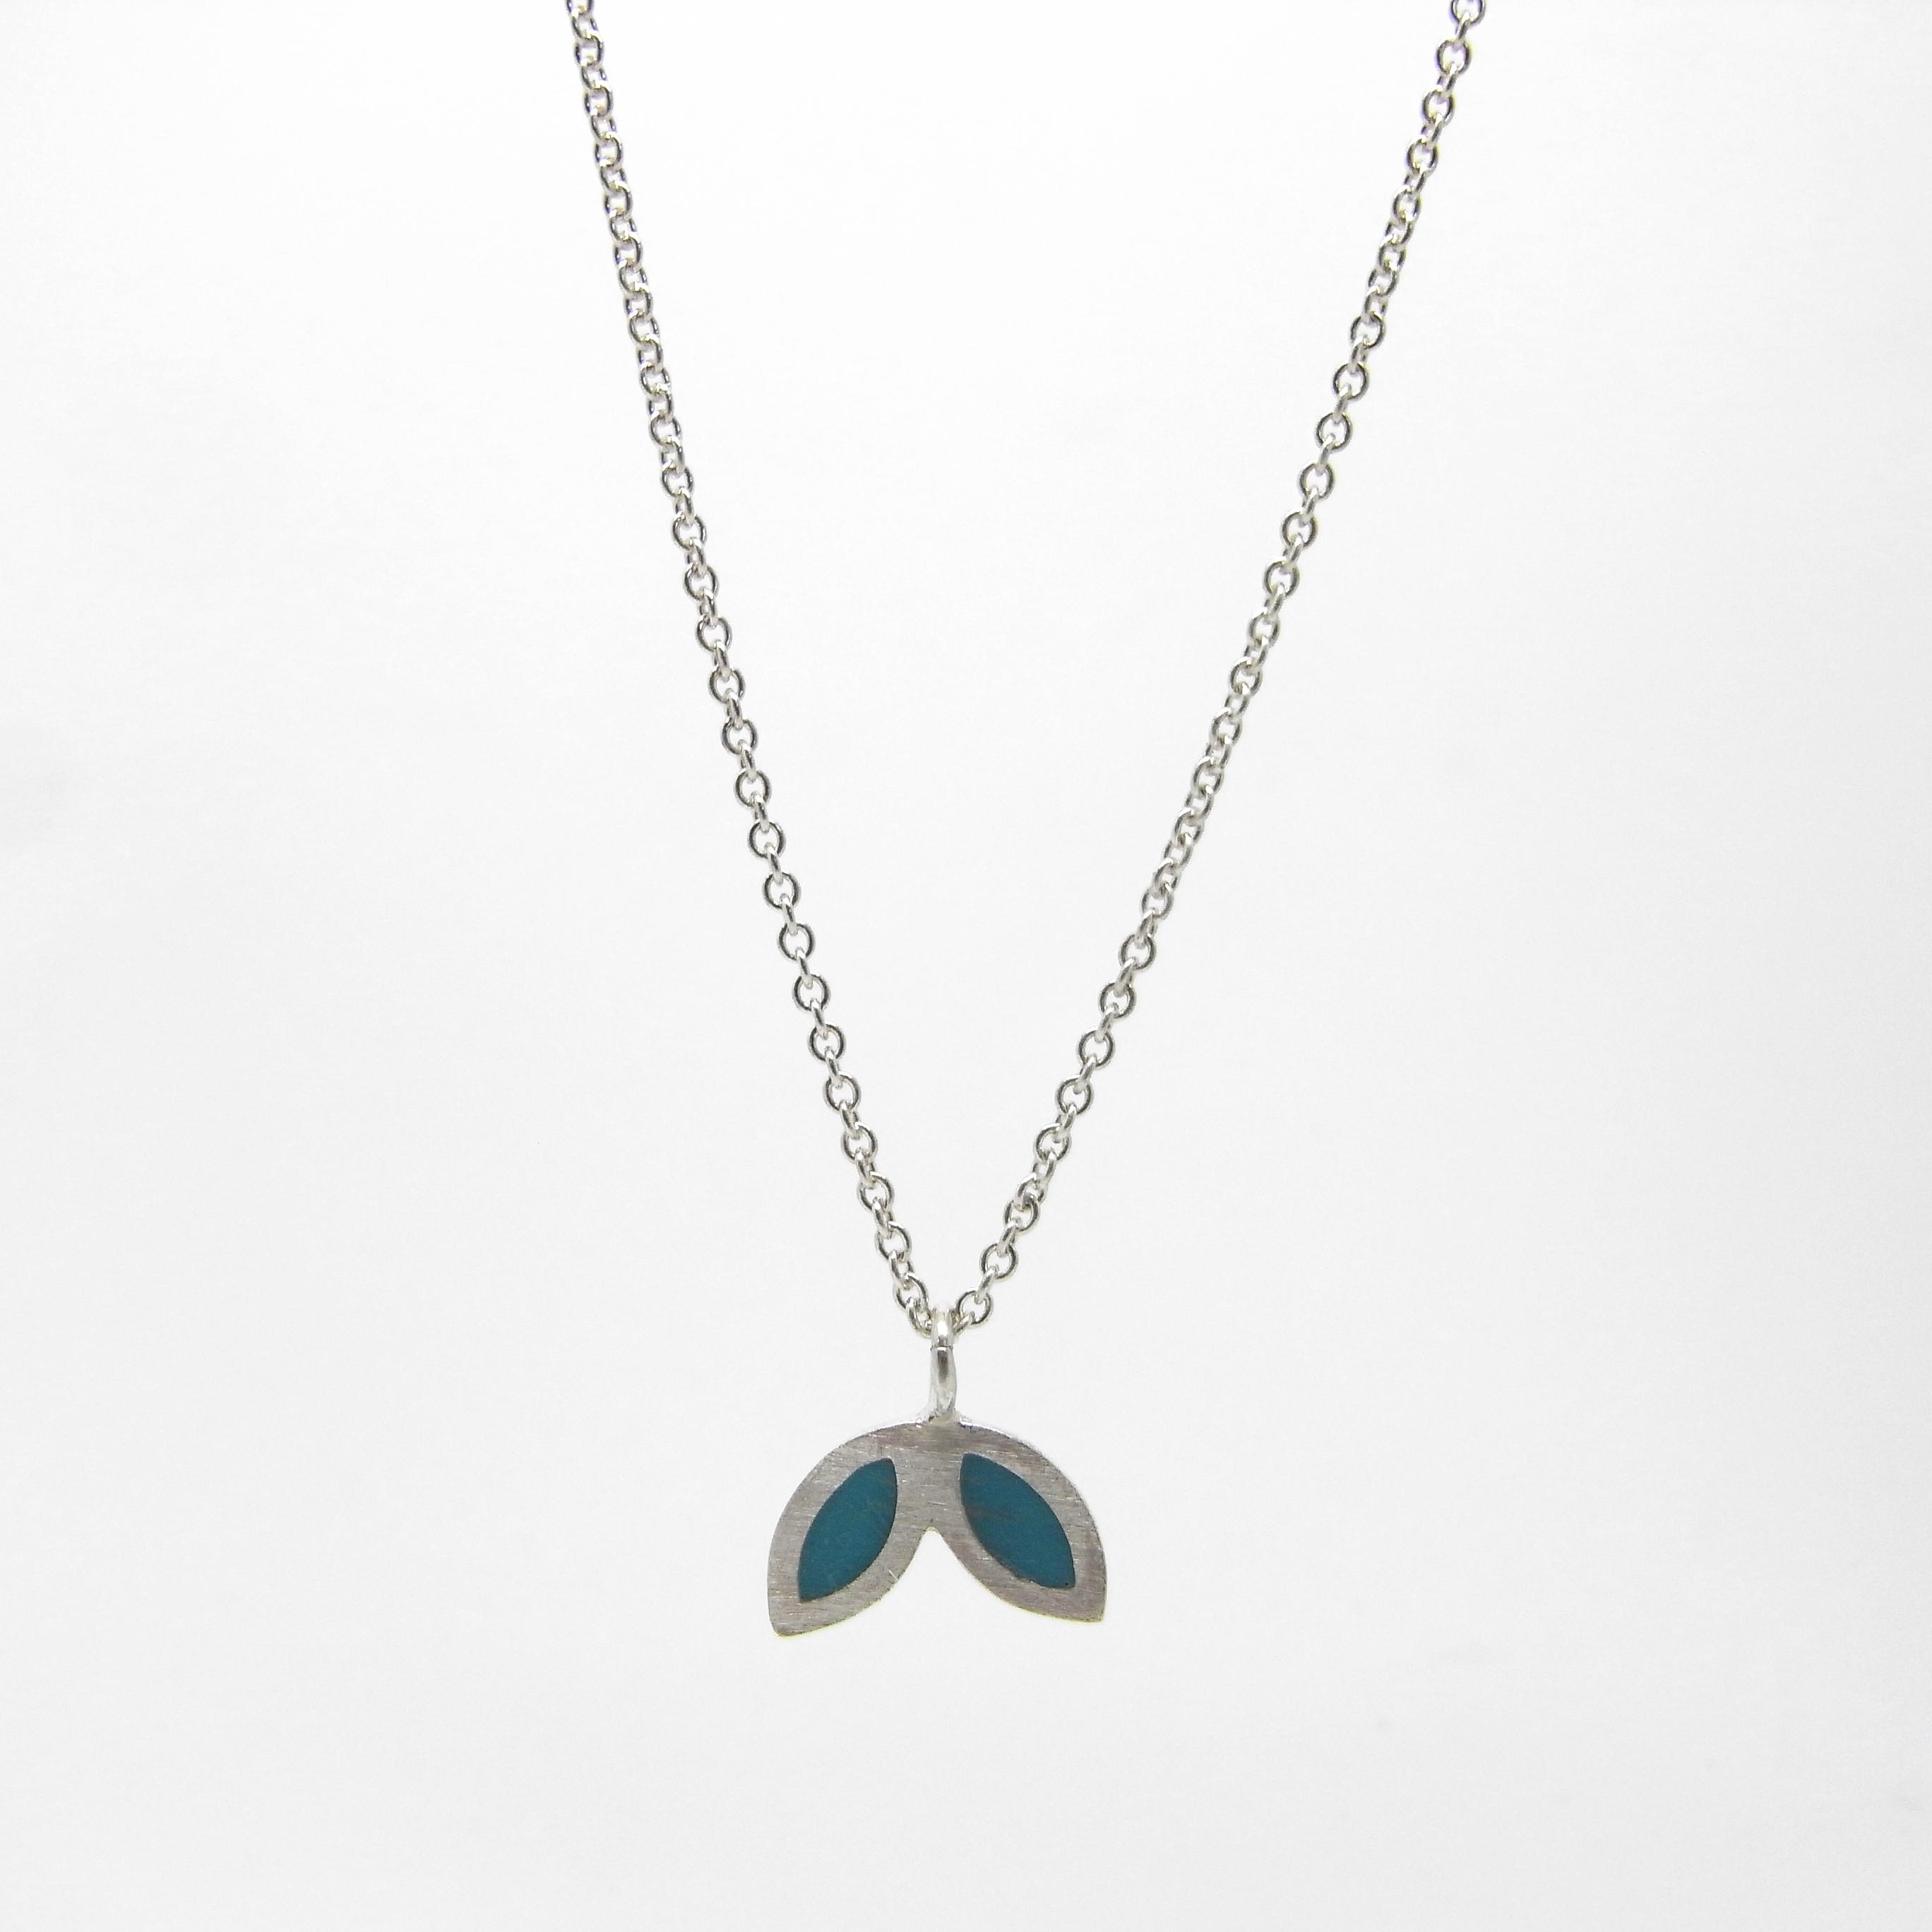 SALE - Silver Petal Necklace - Aqua Marine